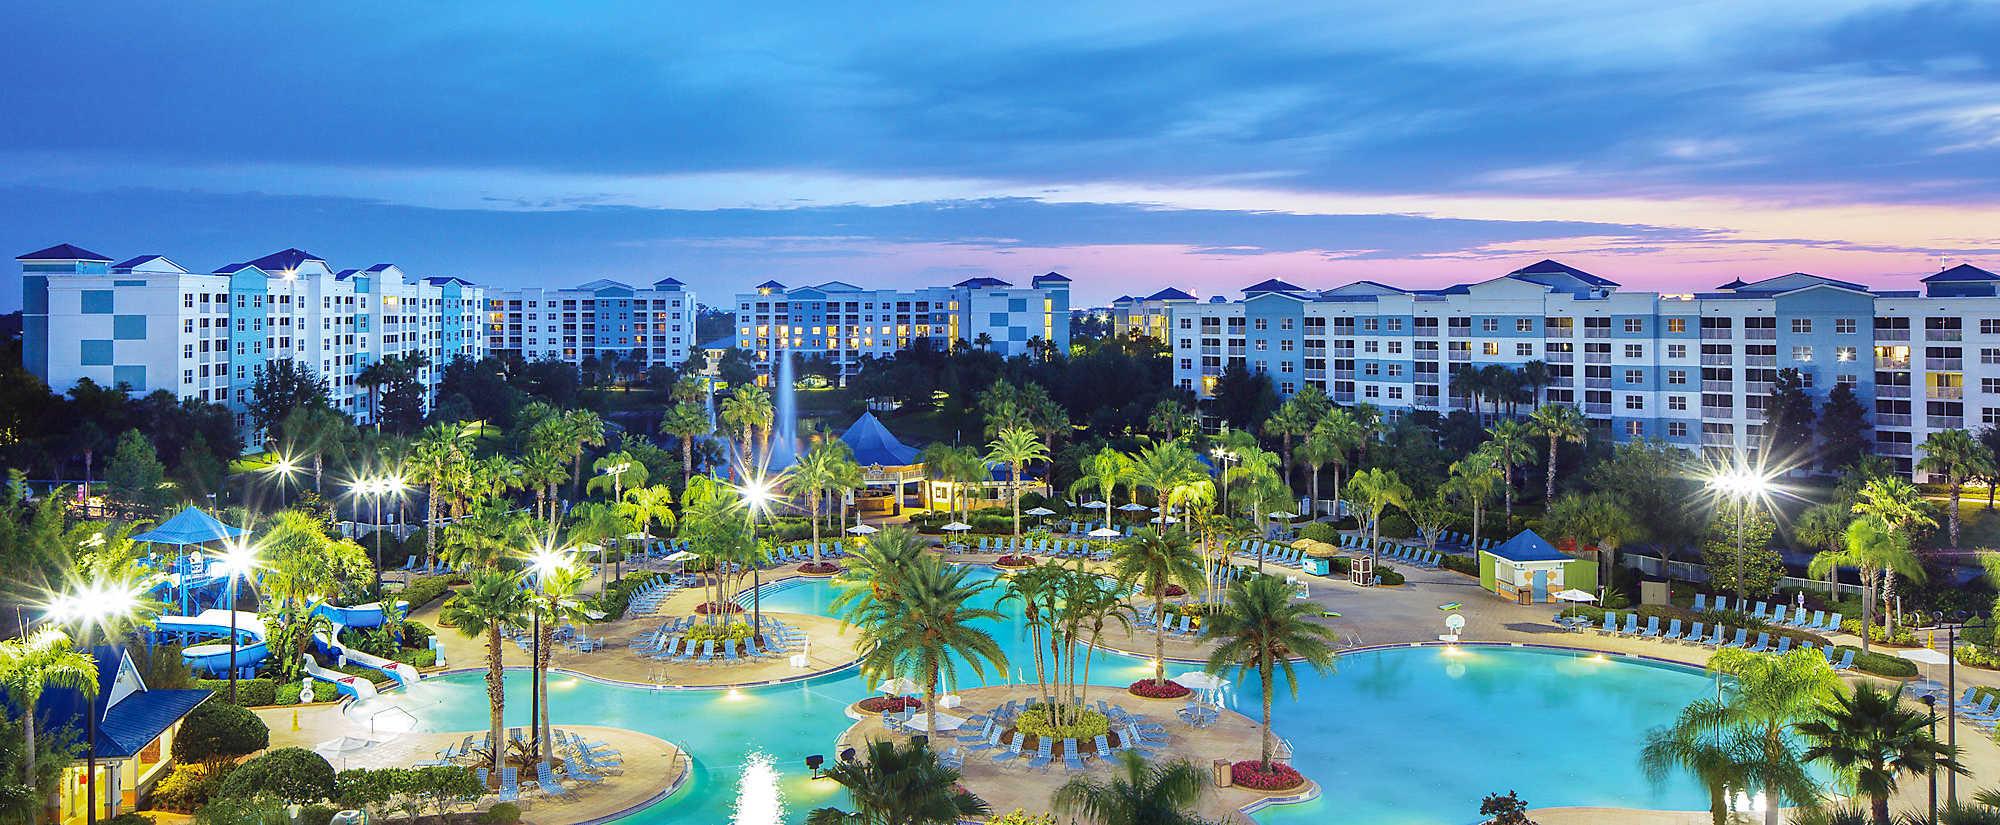 Vacation Resort Rentals | Bluegreen Vacations